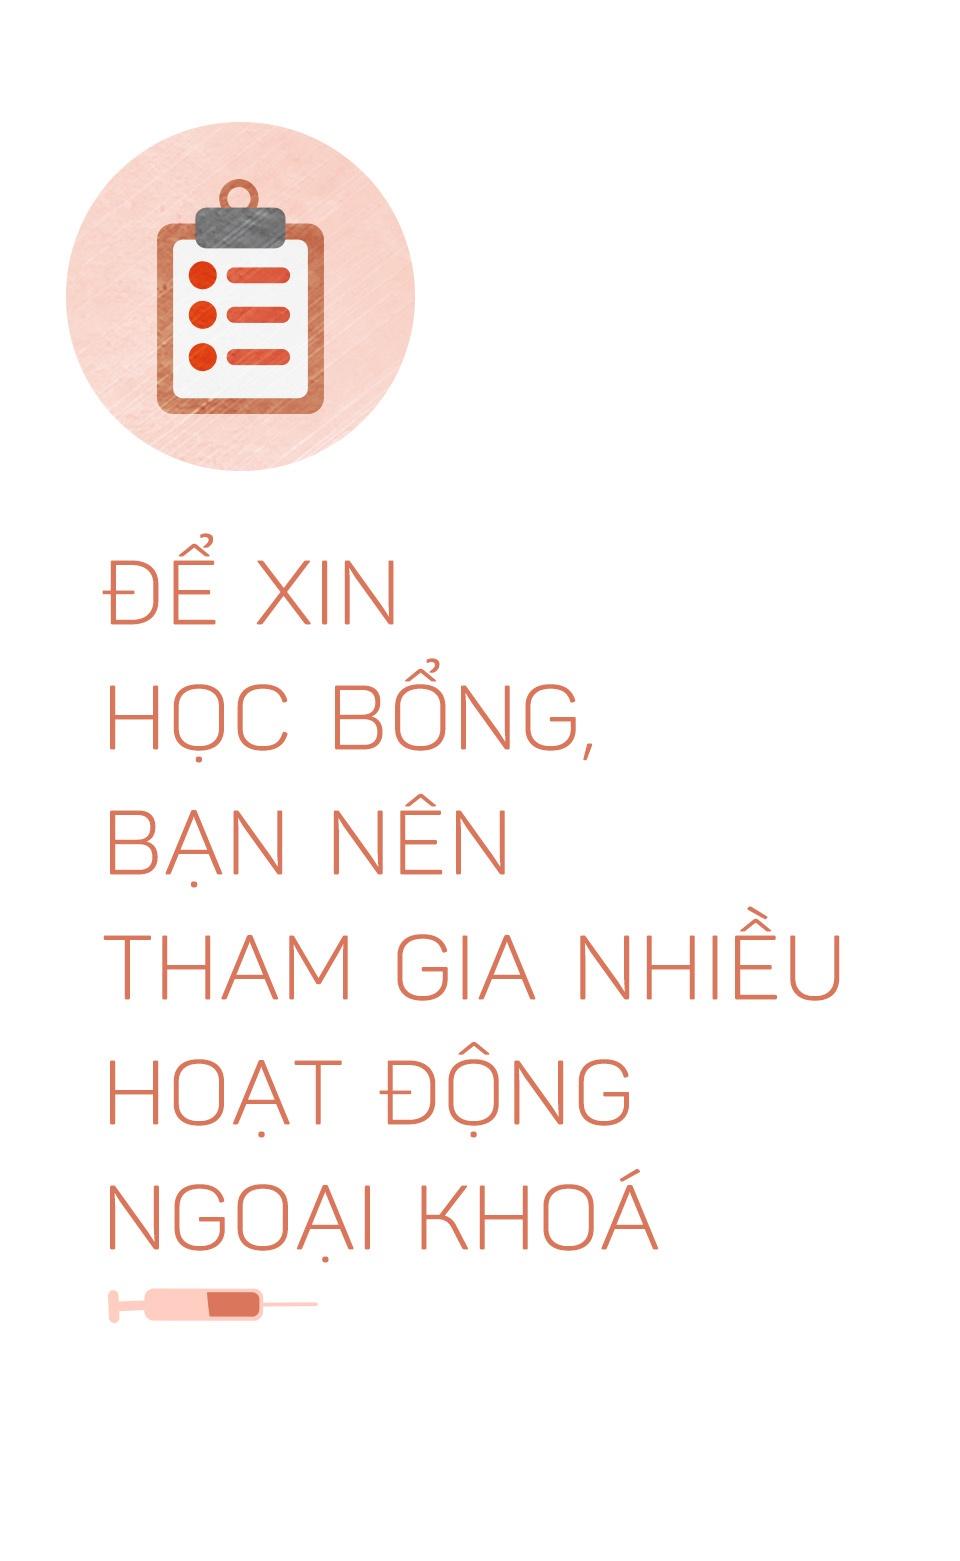 Tien si Viet nghien cuu thuoc chong ung thu, HIV tren dat My hinh anh 5